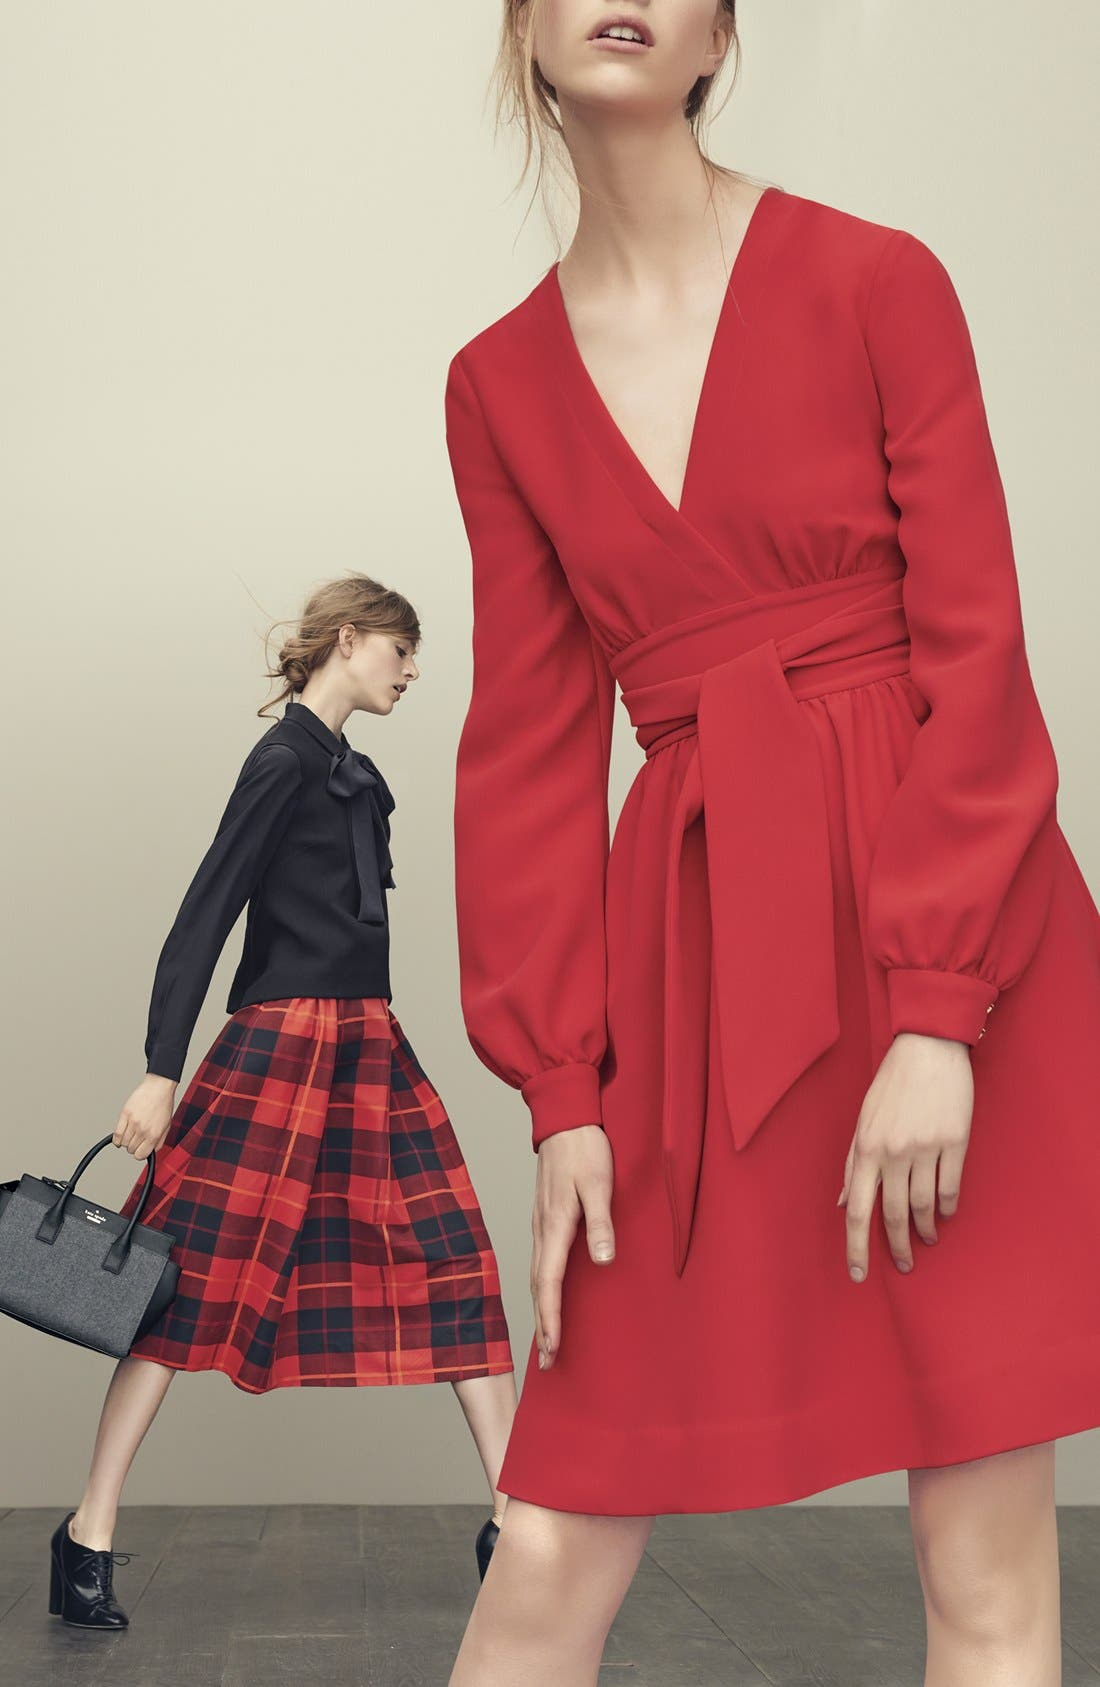 KATE SPADE NEW YORK,                             katespade new yorkwoodland plaid midi skirt,                             Alternate thumbnail 6, color,                             601